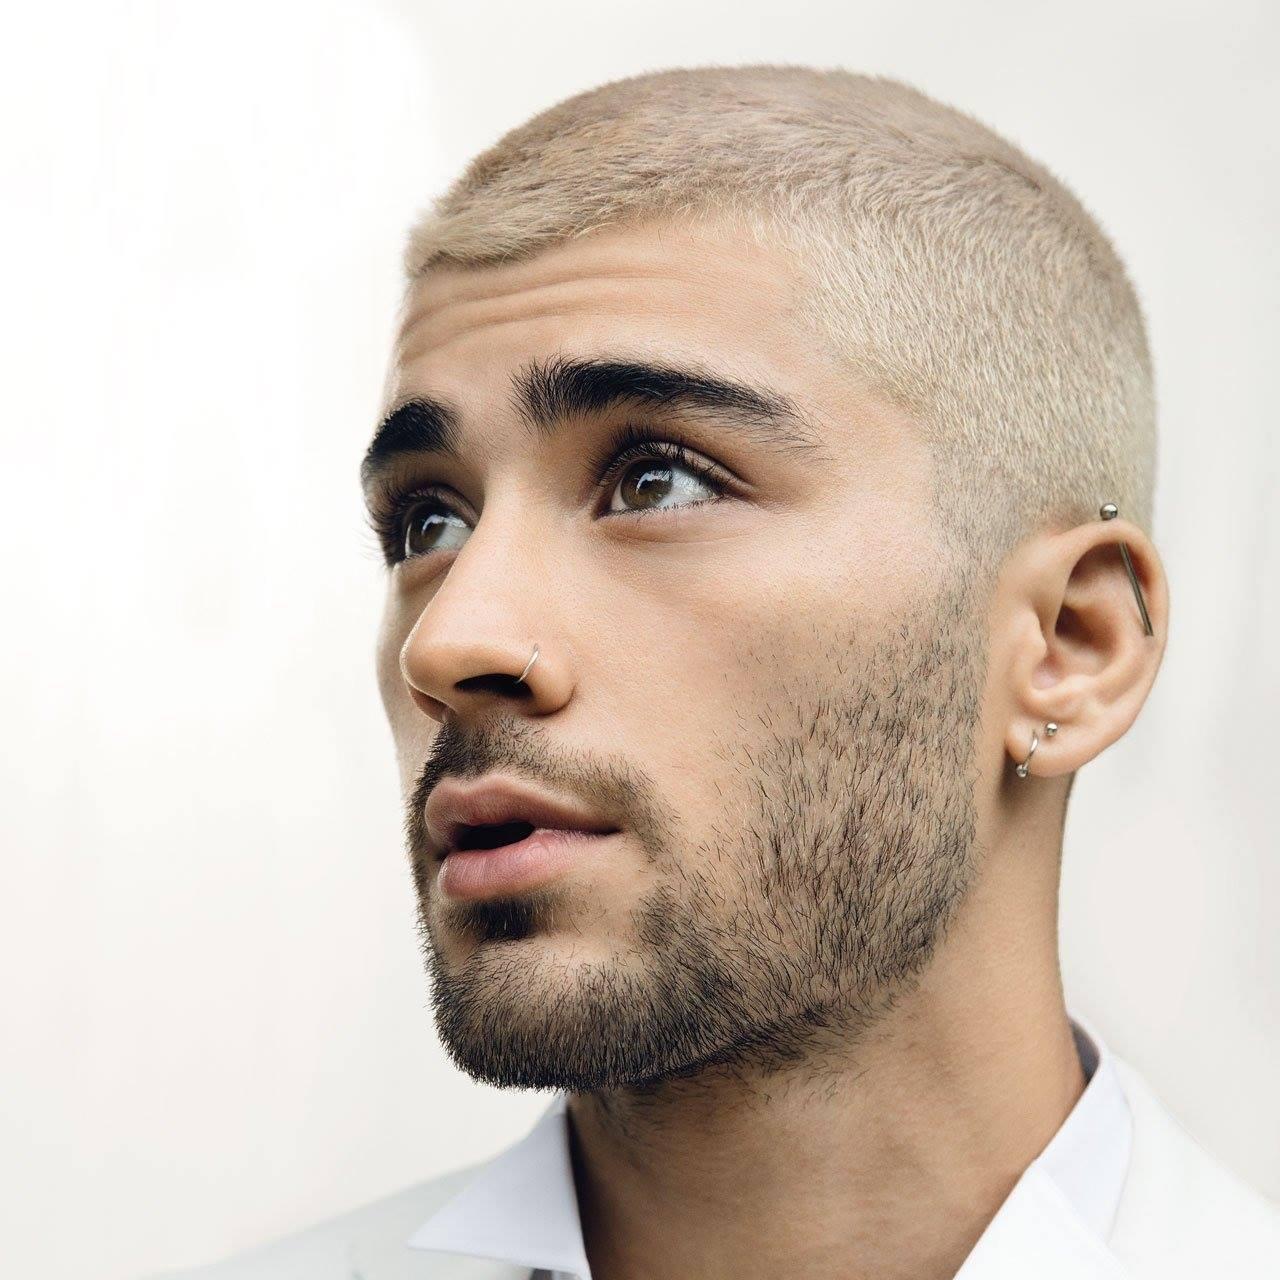 Zayn Malik Hairstyle 2017 Latest Hairstyle - Men's ...